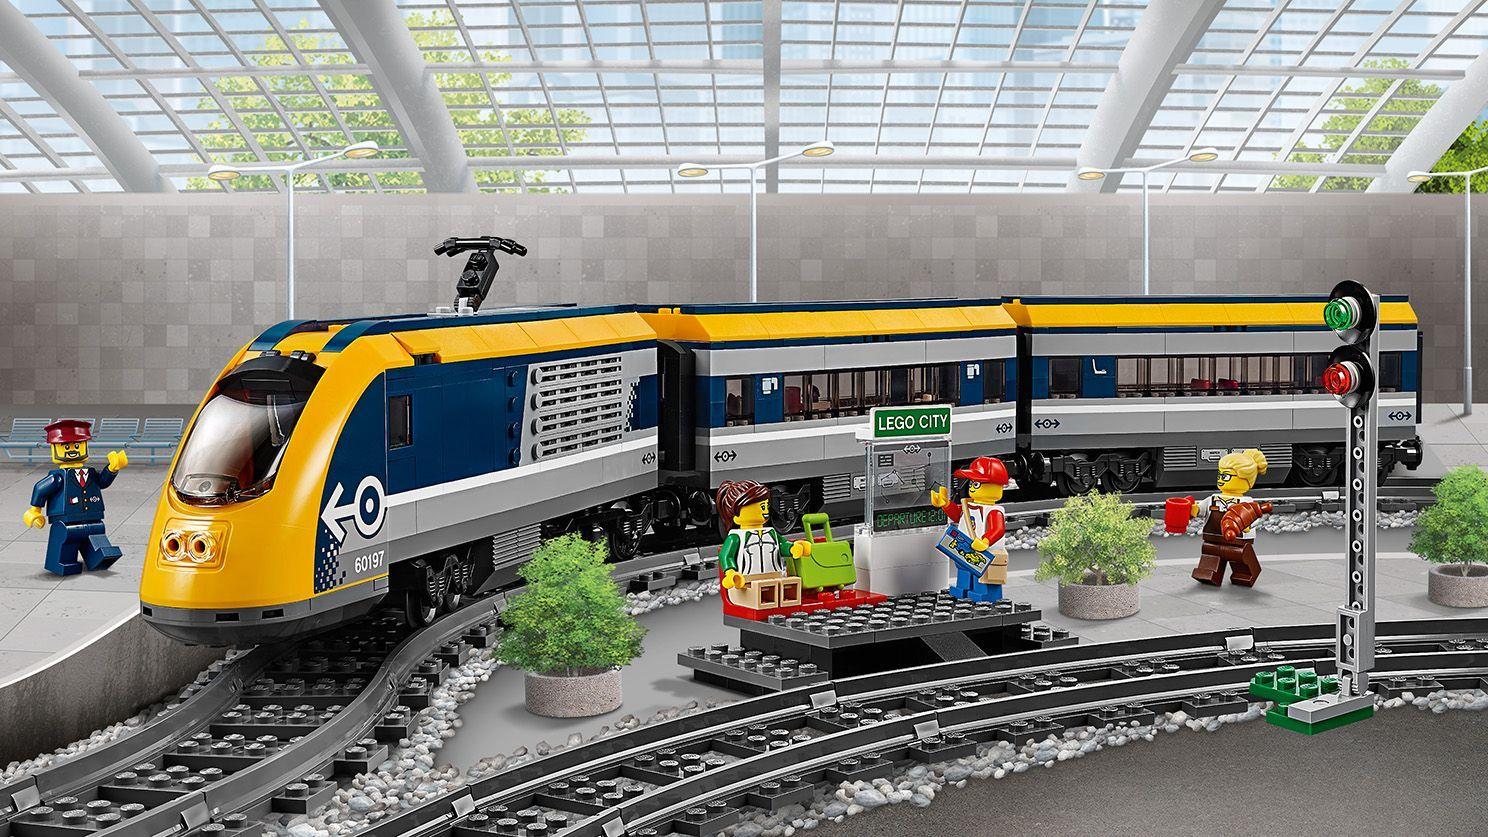 Lego City 60197 Passenger Train Lego City Sets Train Lego City